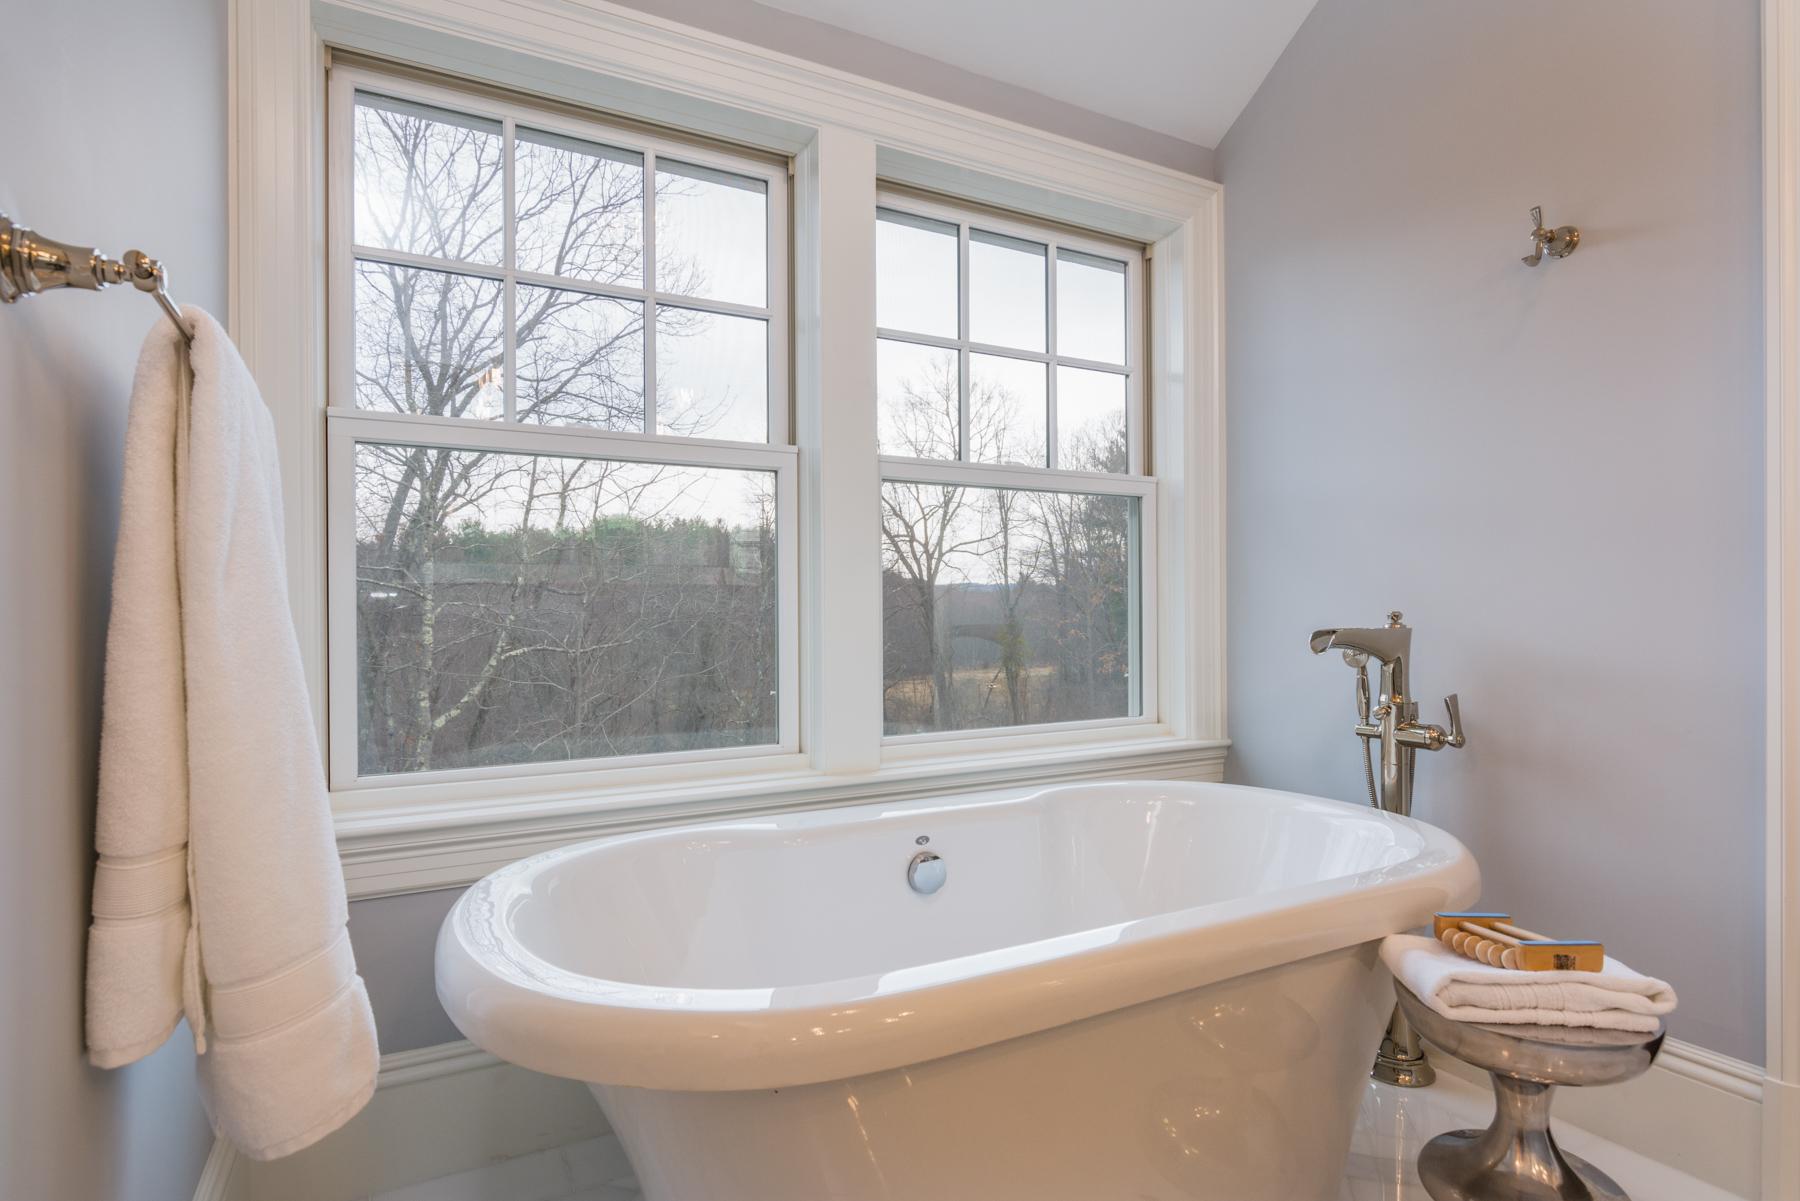 38StandishRd-Bath2-LoRes.jpg